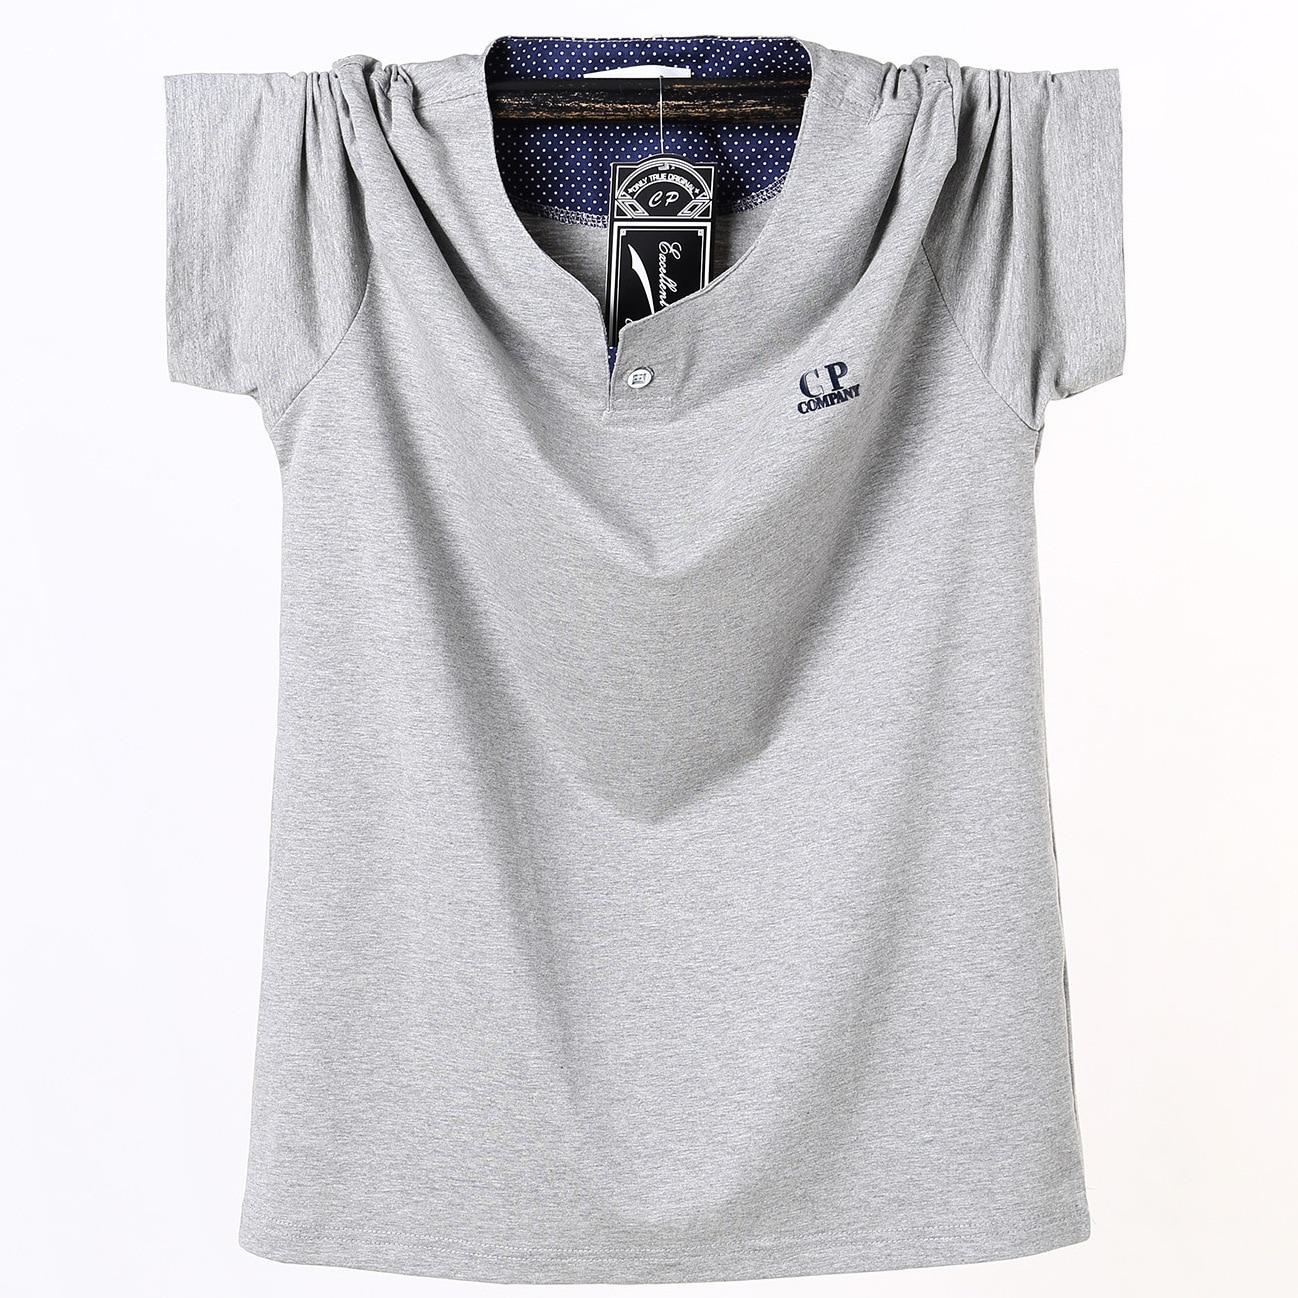 CP Plus-sized Short Sleeve T-shirt Men'S Wear Loose-Fit Lard-bucket Sports Fat Half Sleeve Extra Large MEN'S T-shirt 8335